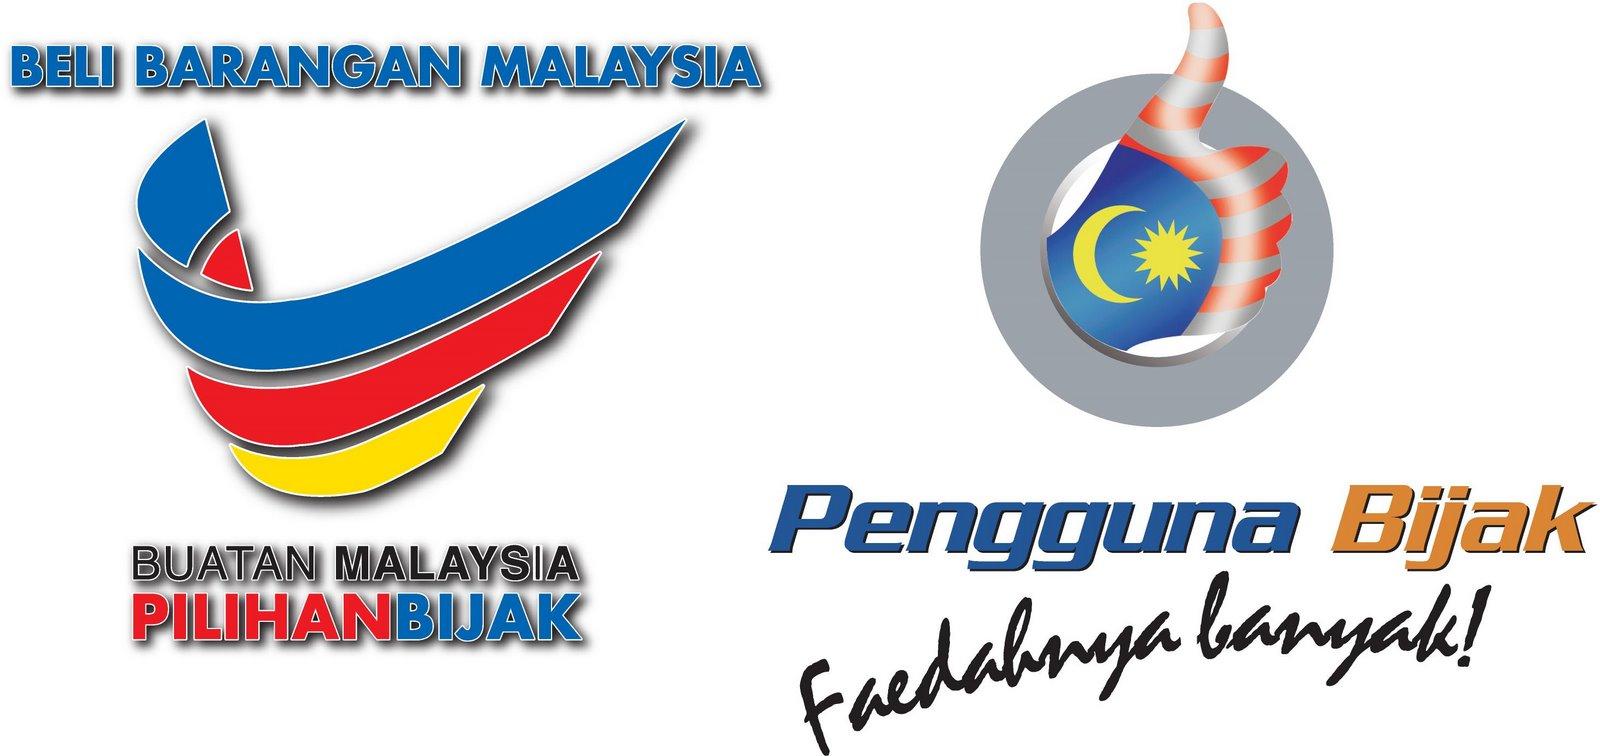 Beauty shop online malaysia